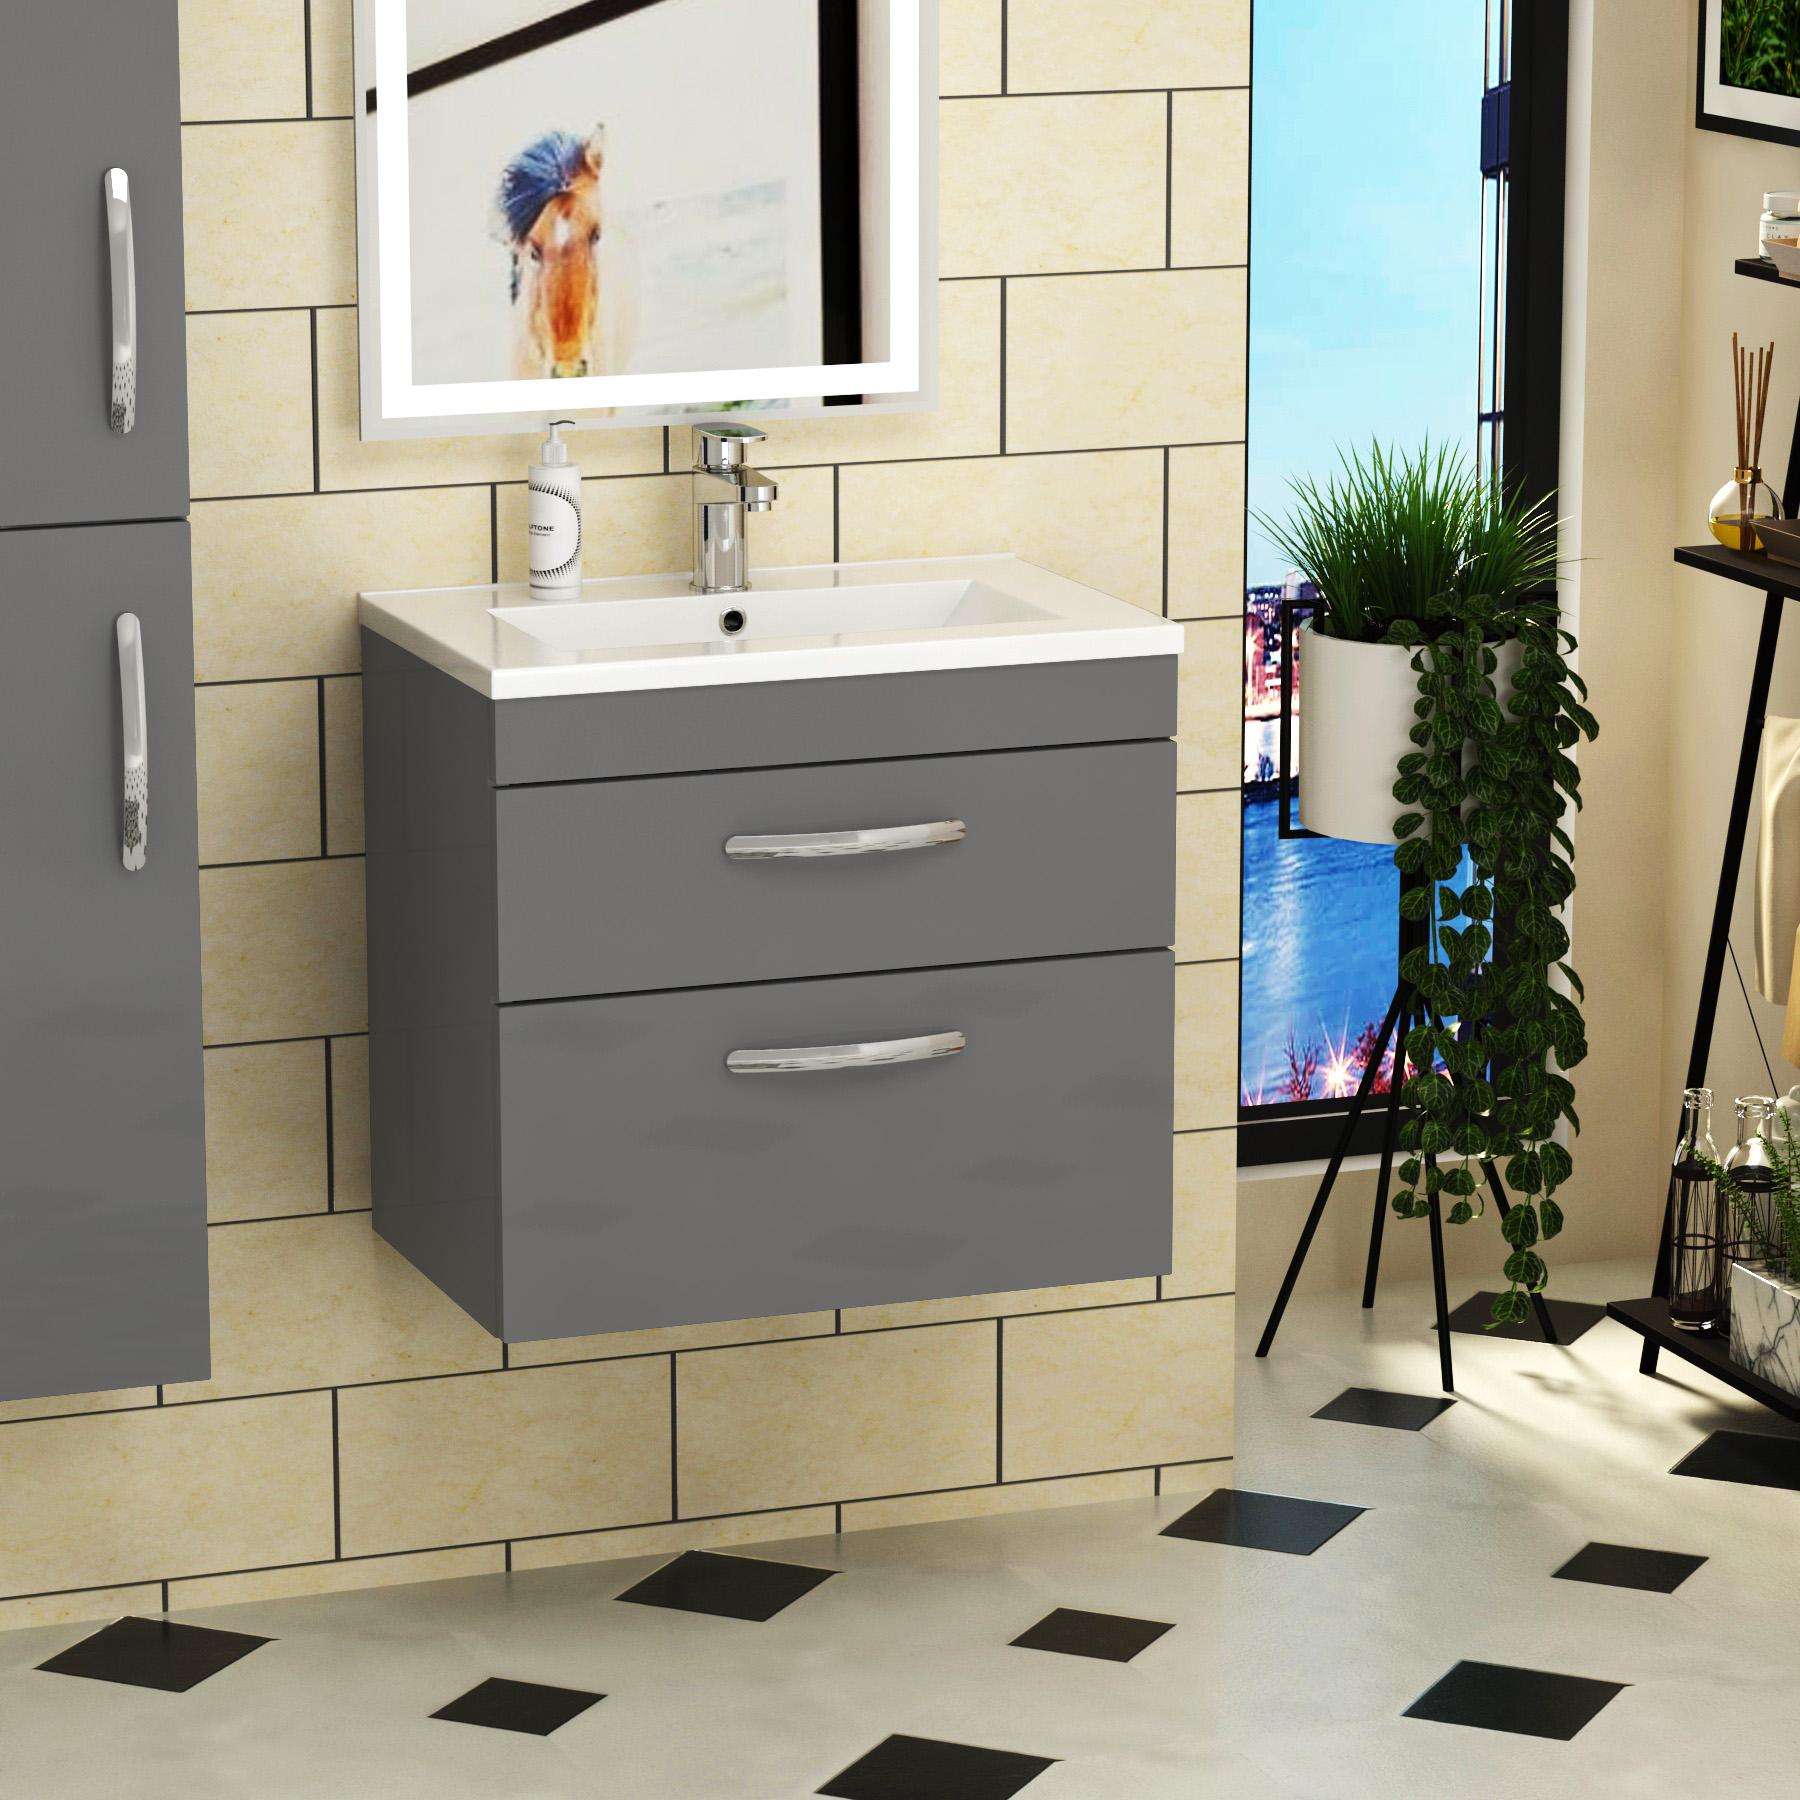 Bathroom Vanity Unit Basin Sink Furniture Cabinet Storage